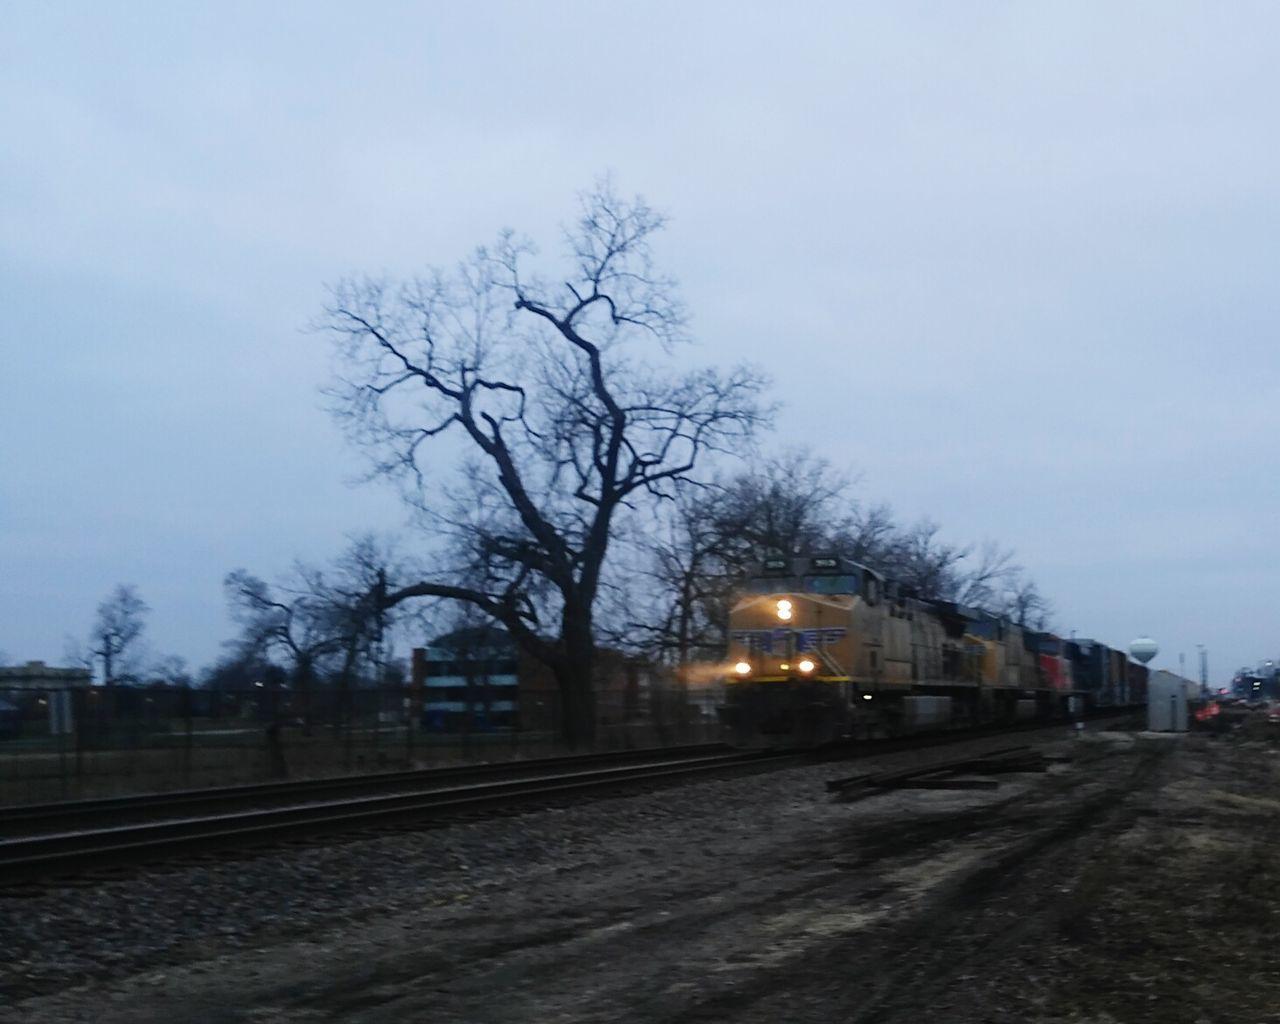 transportation, railroad track, rail transportation, public transportation, train - vehicle, mode of transport, sky, travel, outdoors, no people, tree, nature, illuminated, day